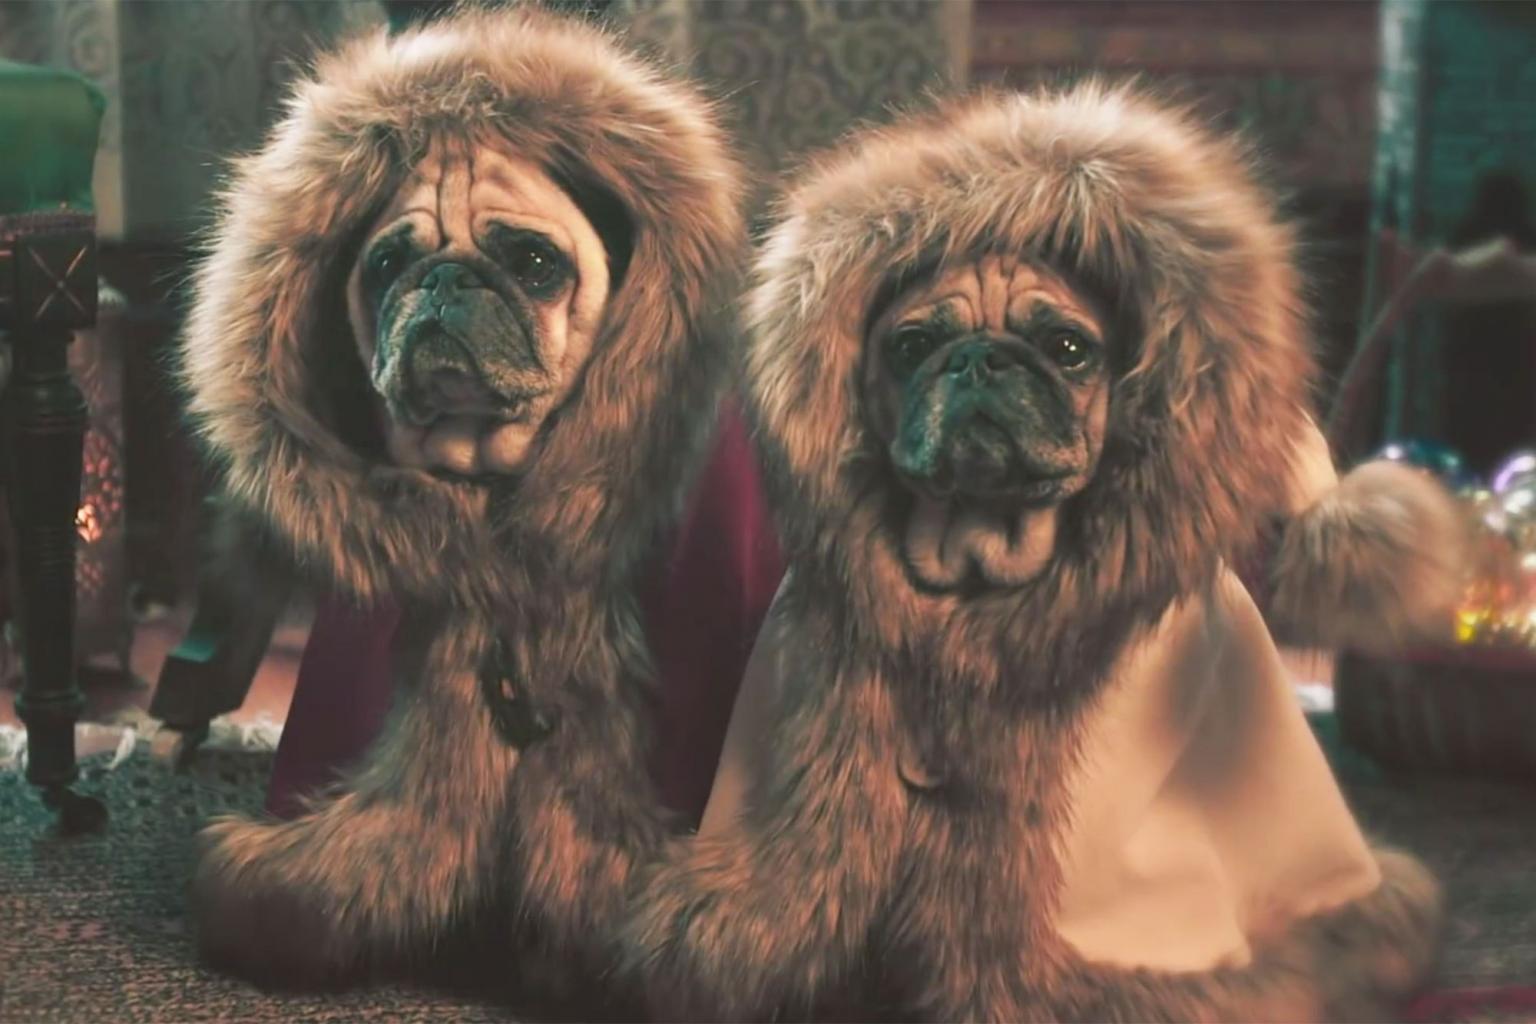 Watch: Precious Pugs Make Winter Wonderland Even More Wonderful